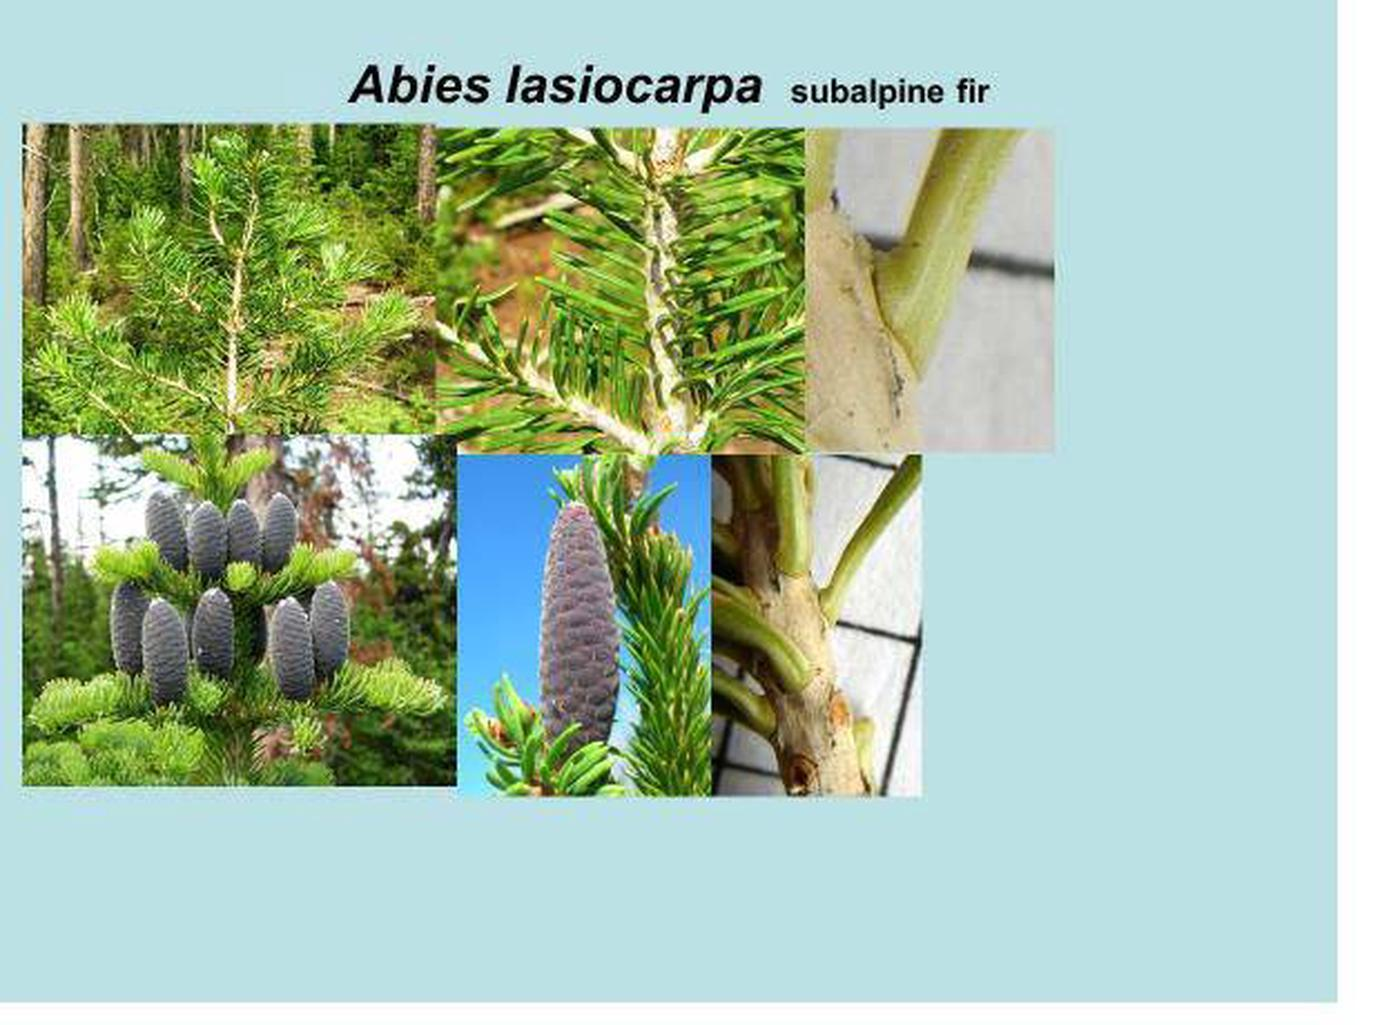 Subalpine fir id.